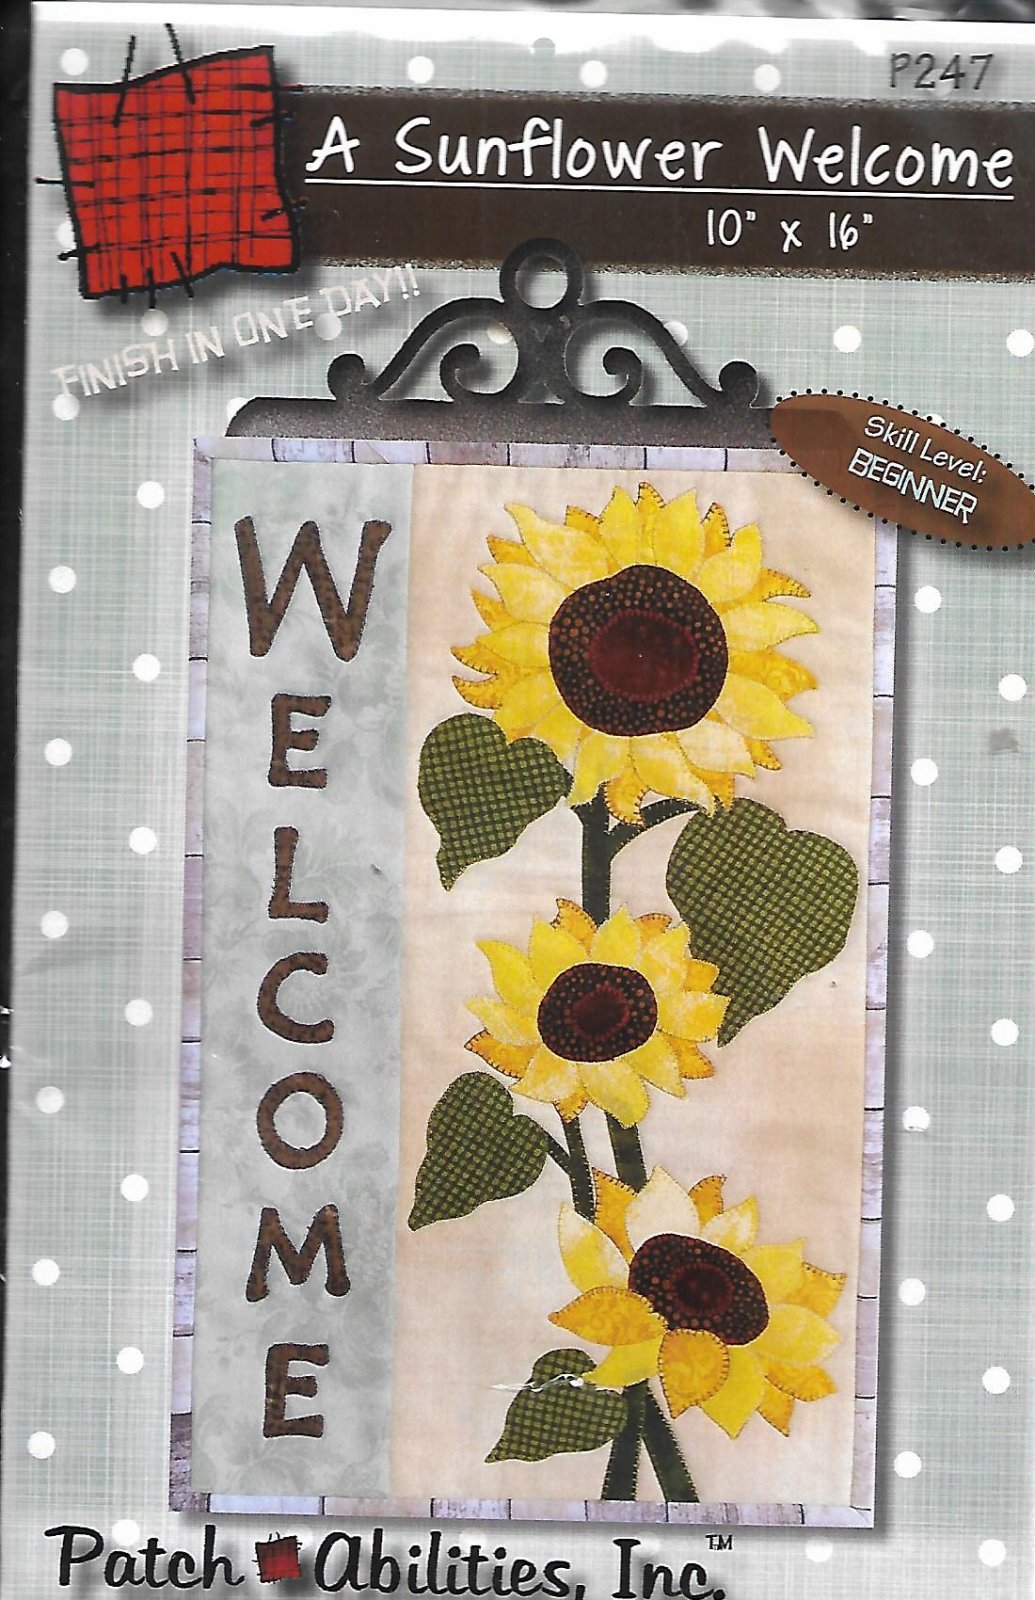 A Sunflower Welcome P247 Wall Hanger Pattern